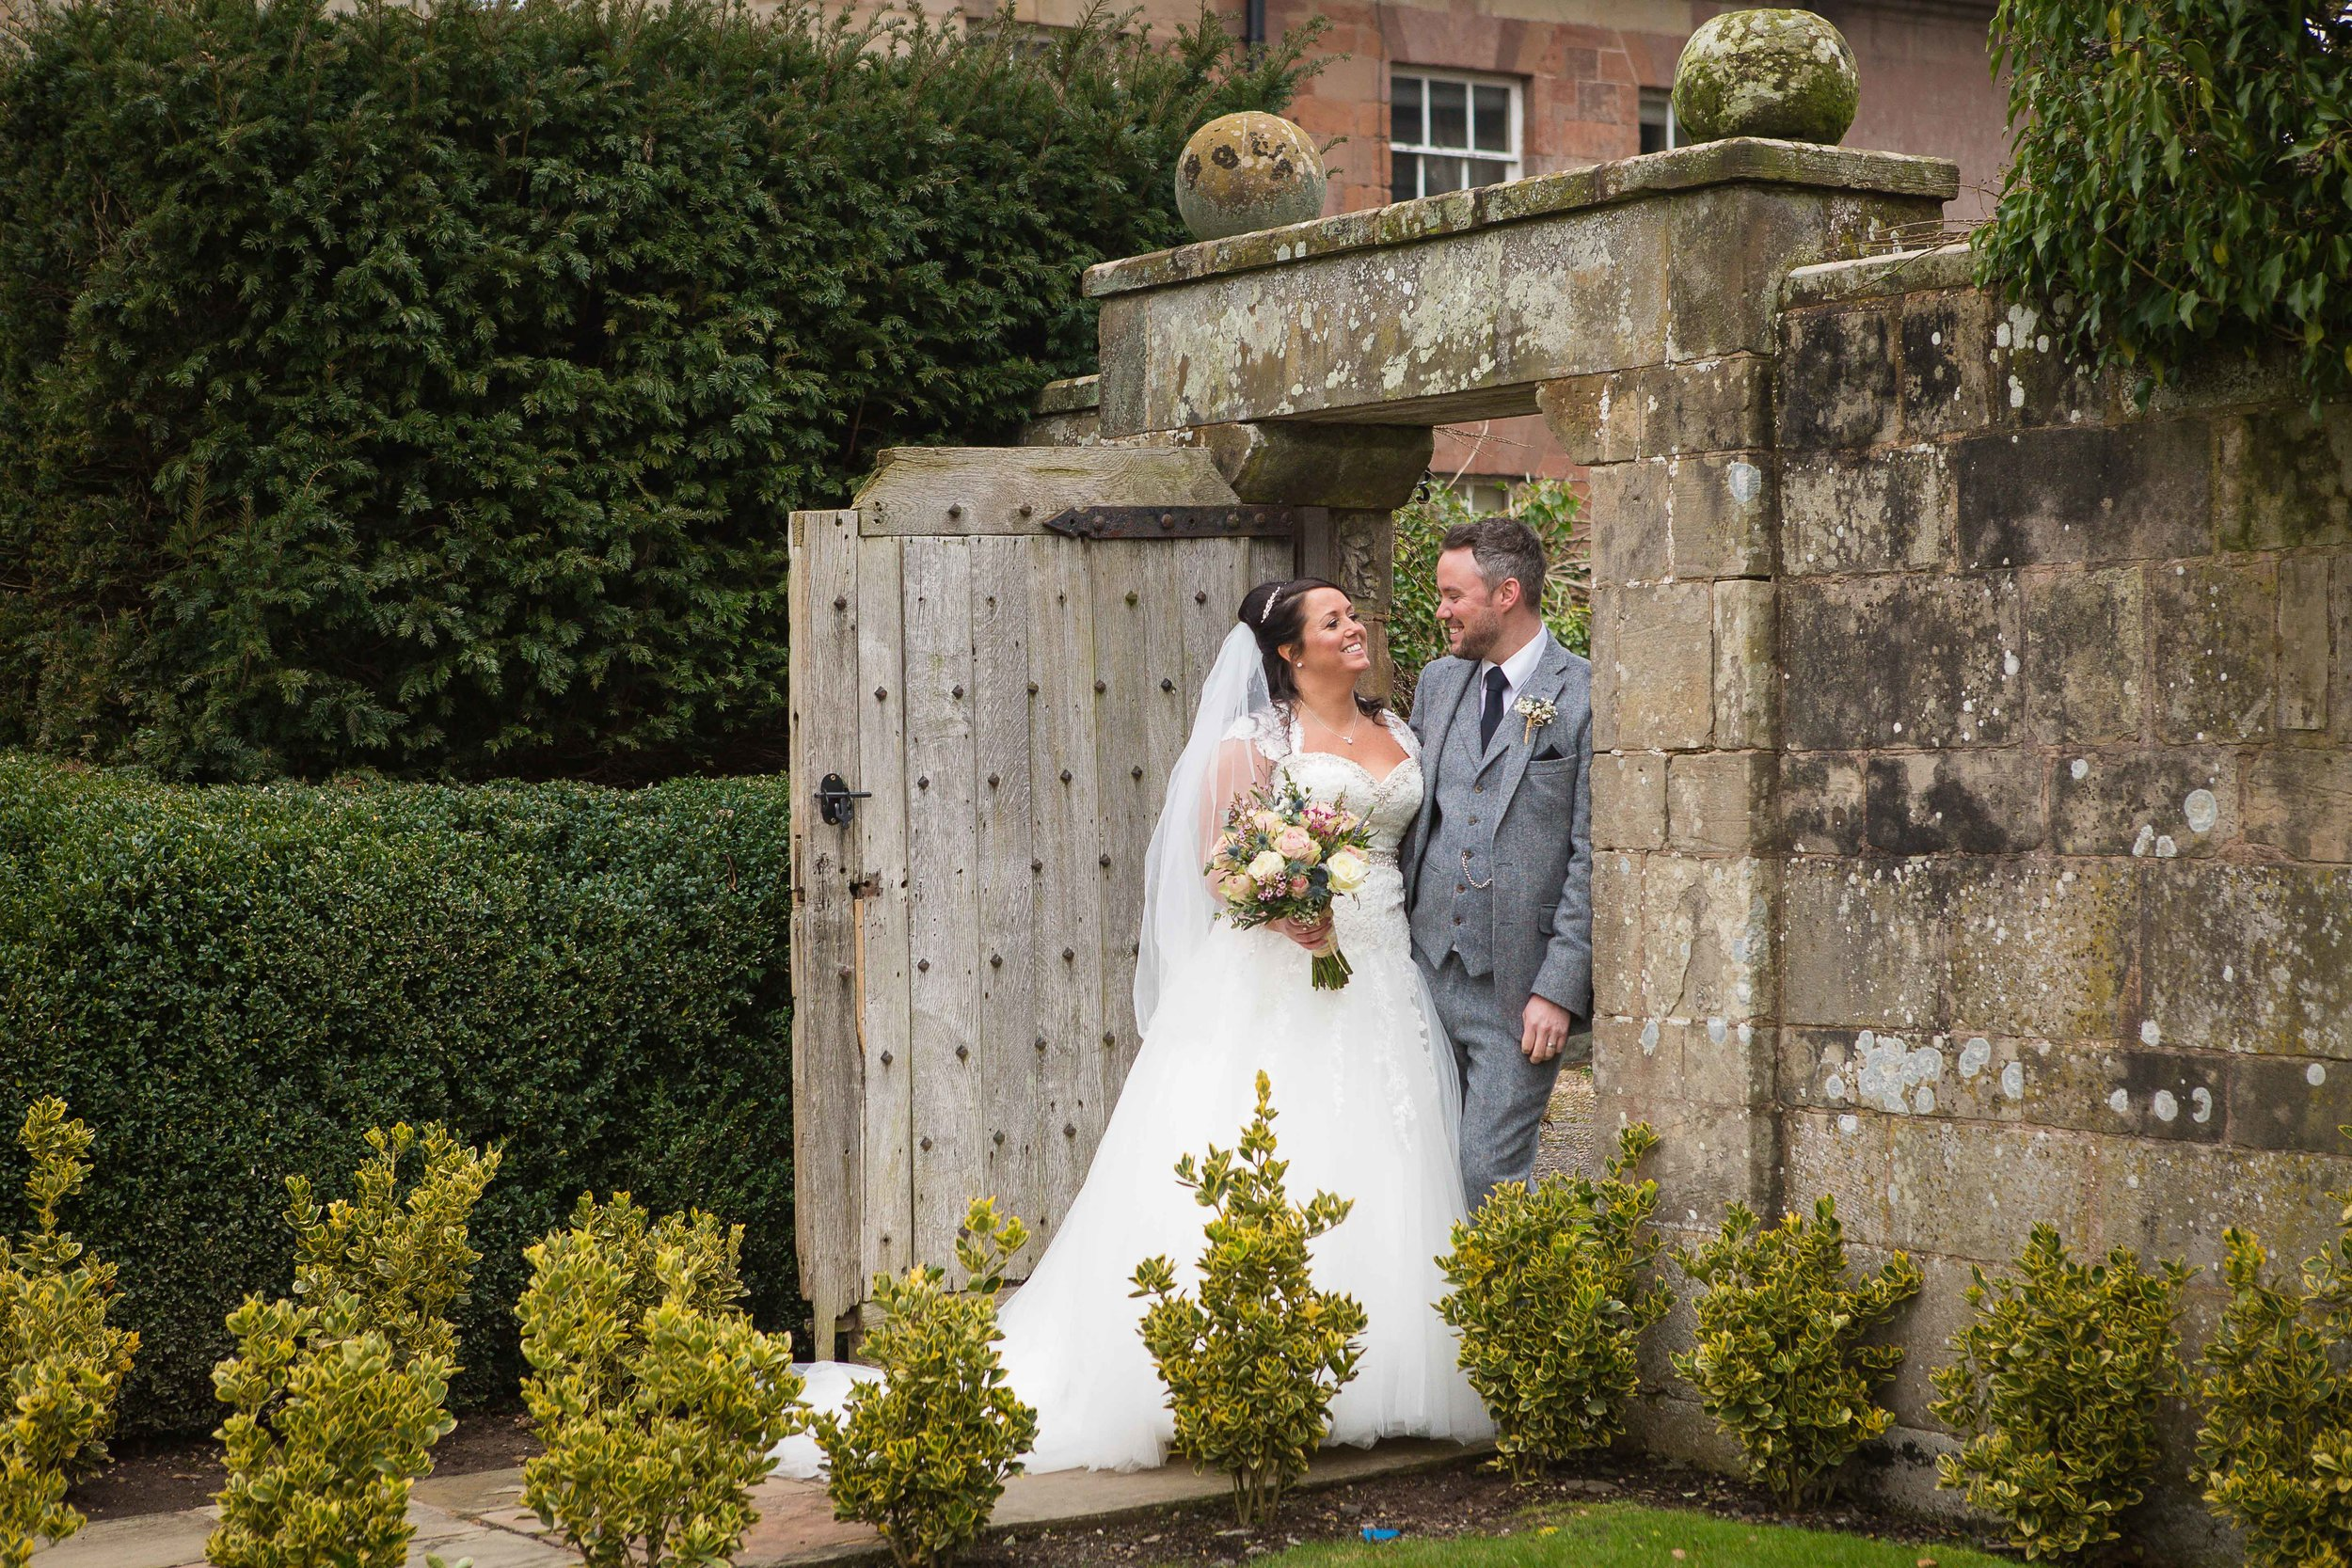 14.02.17 - Matt-Faye-Coombe-Abbey-Valentine-Wedding-Charnwood-Photography-1073.jpg